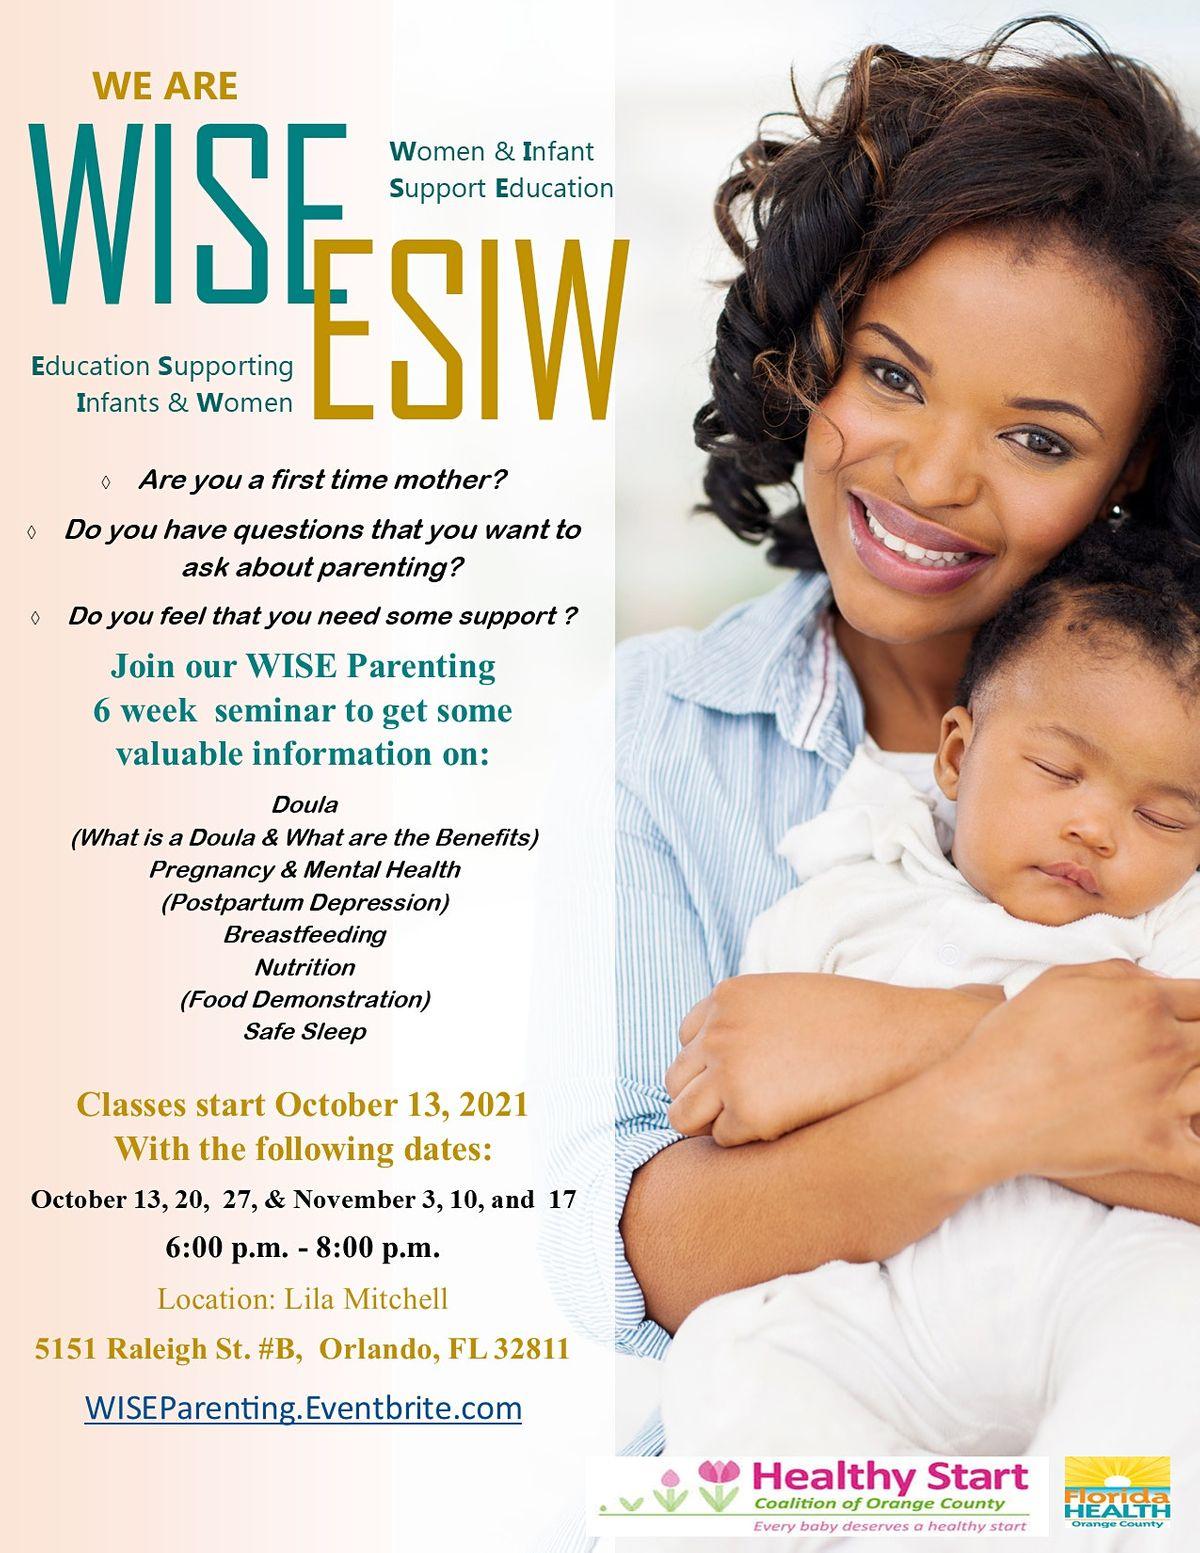 W.I.S.E - Women Infant Support Education